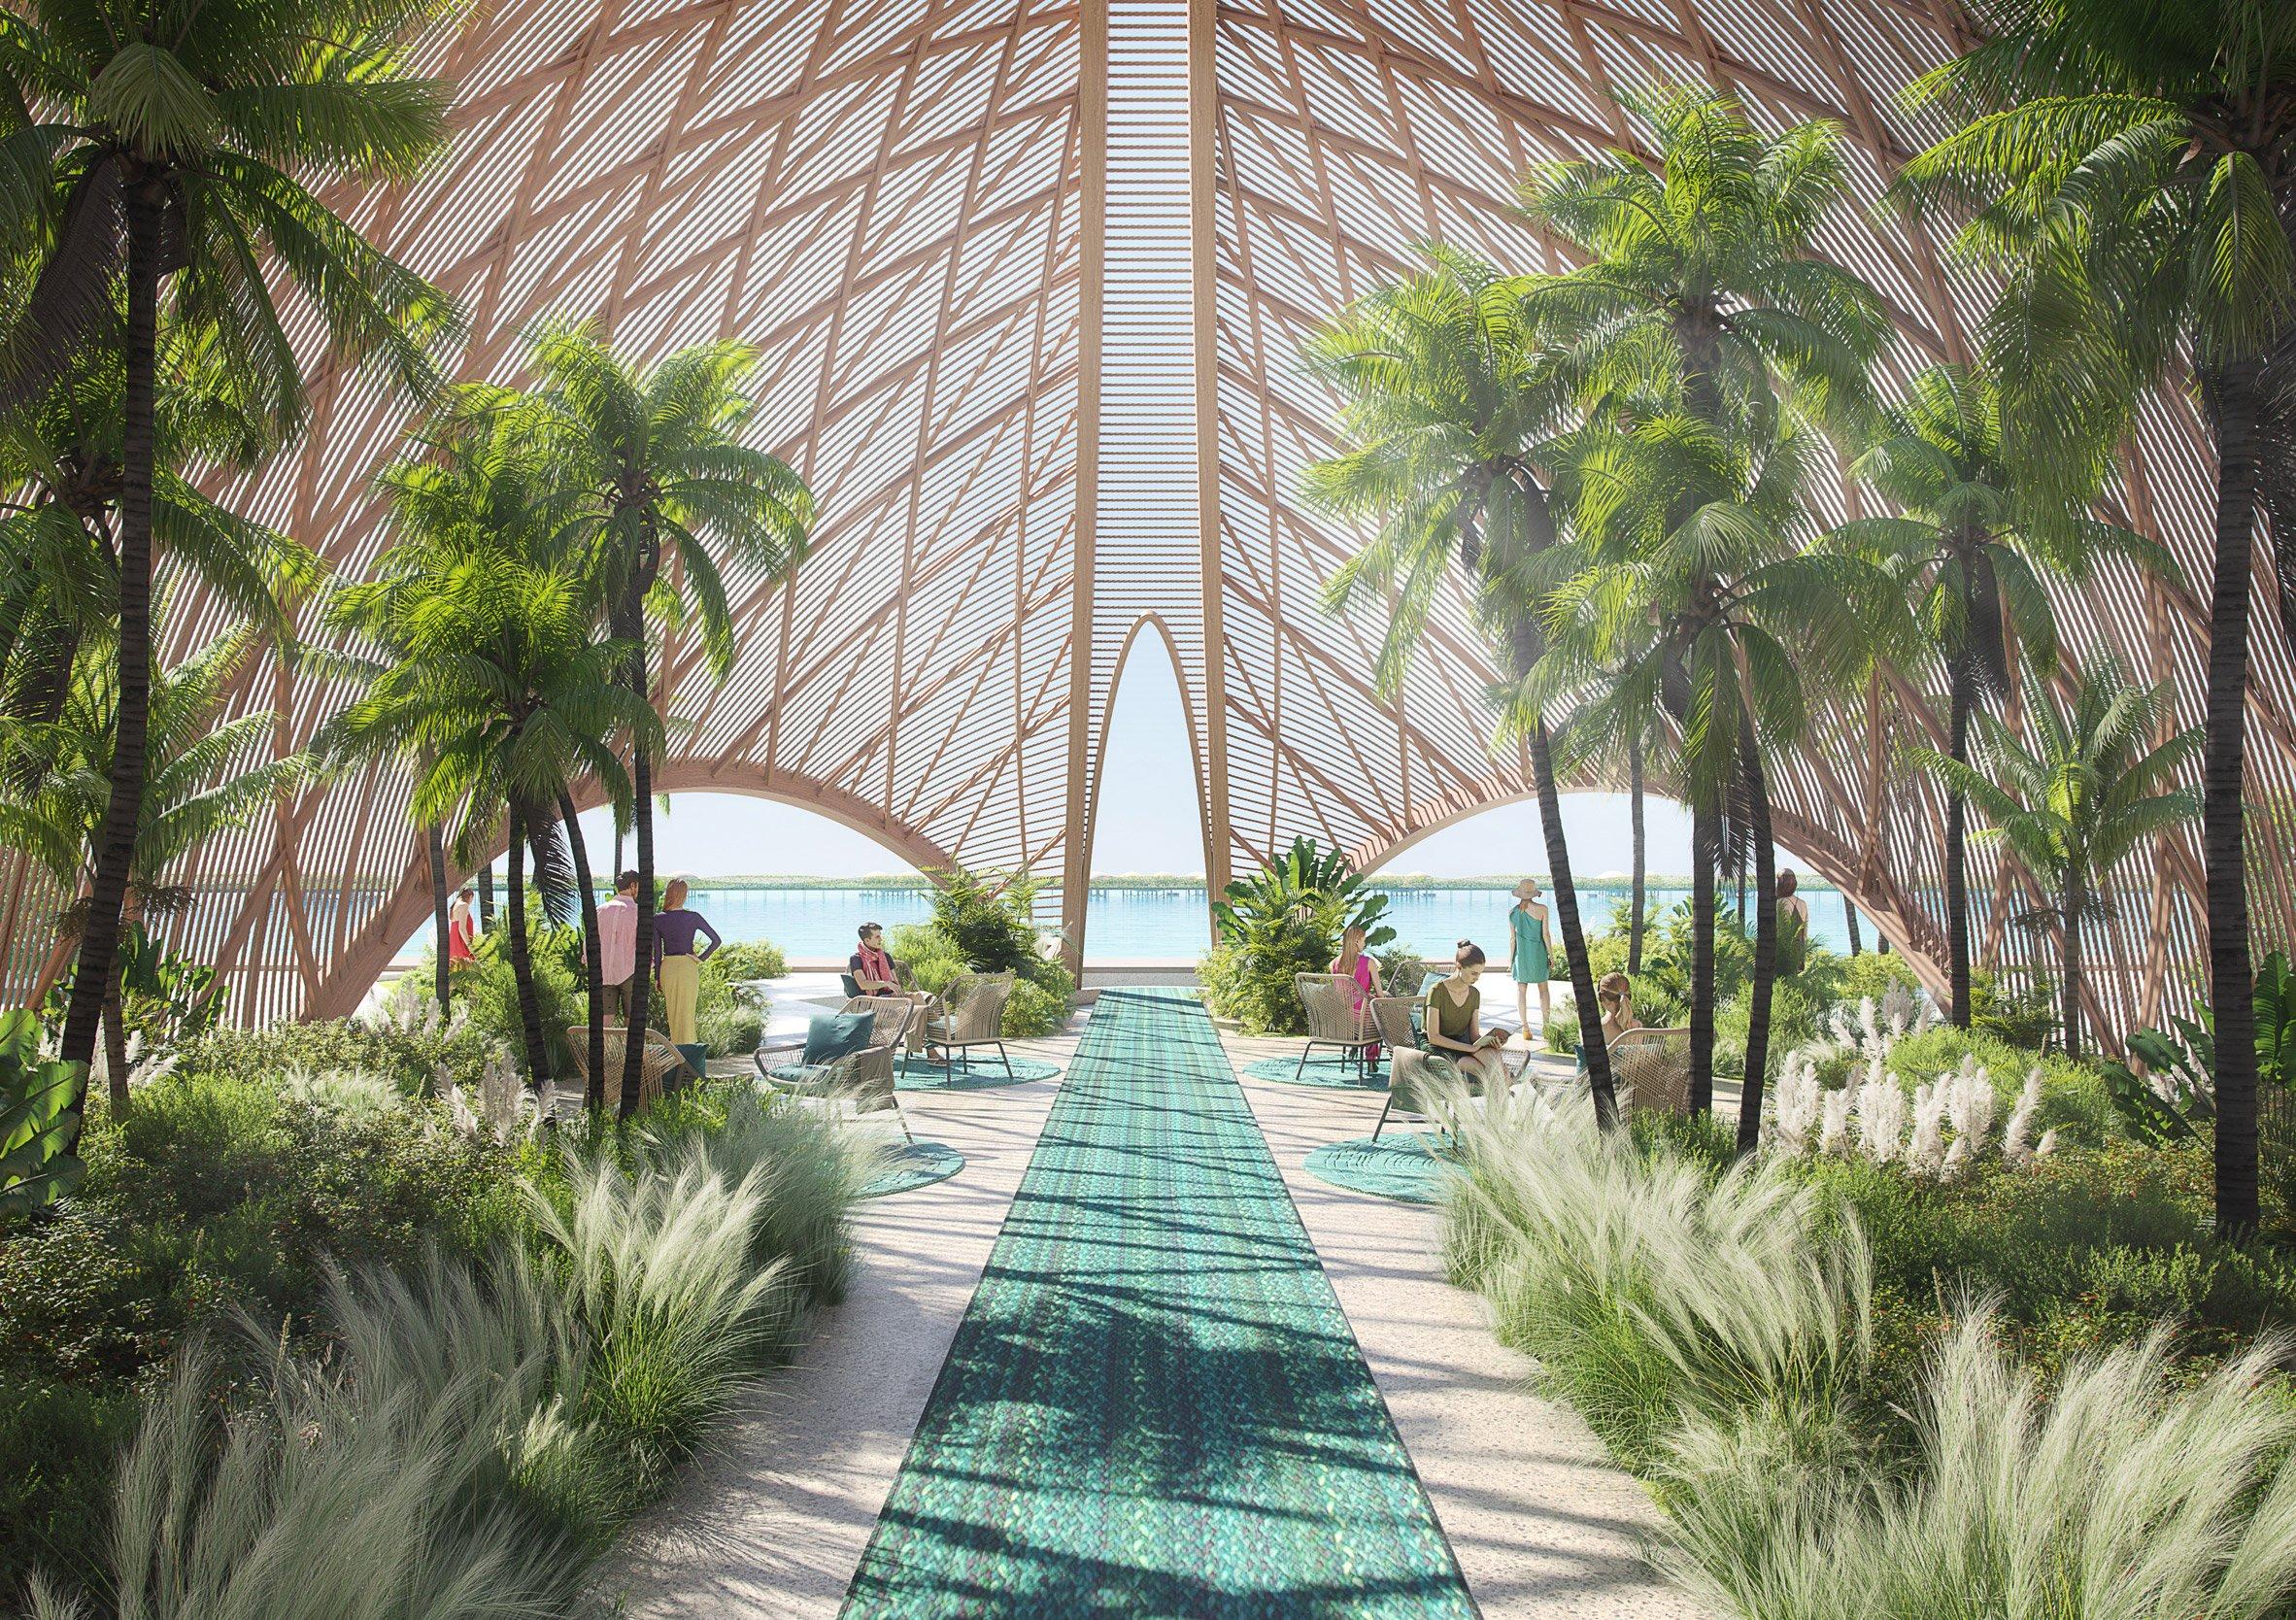 Timber-roofed hotel in Saudi Arabia